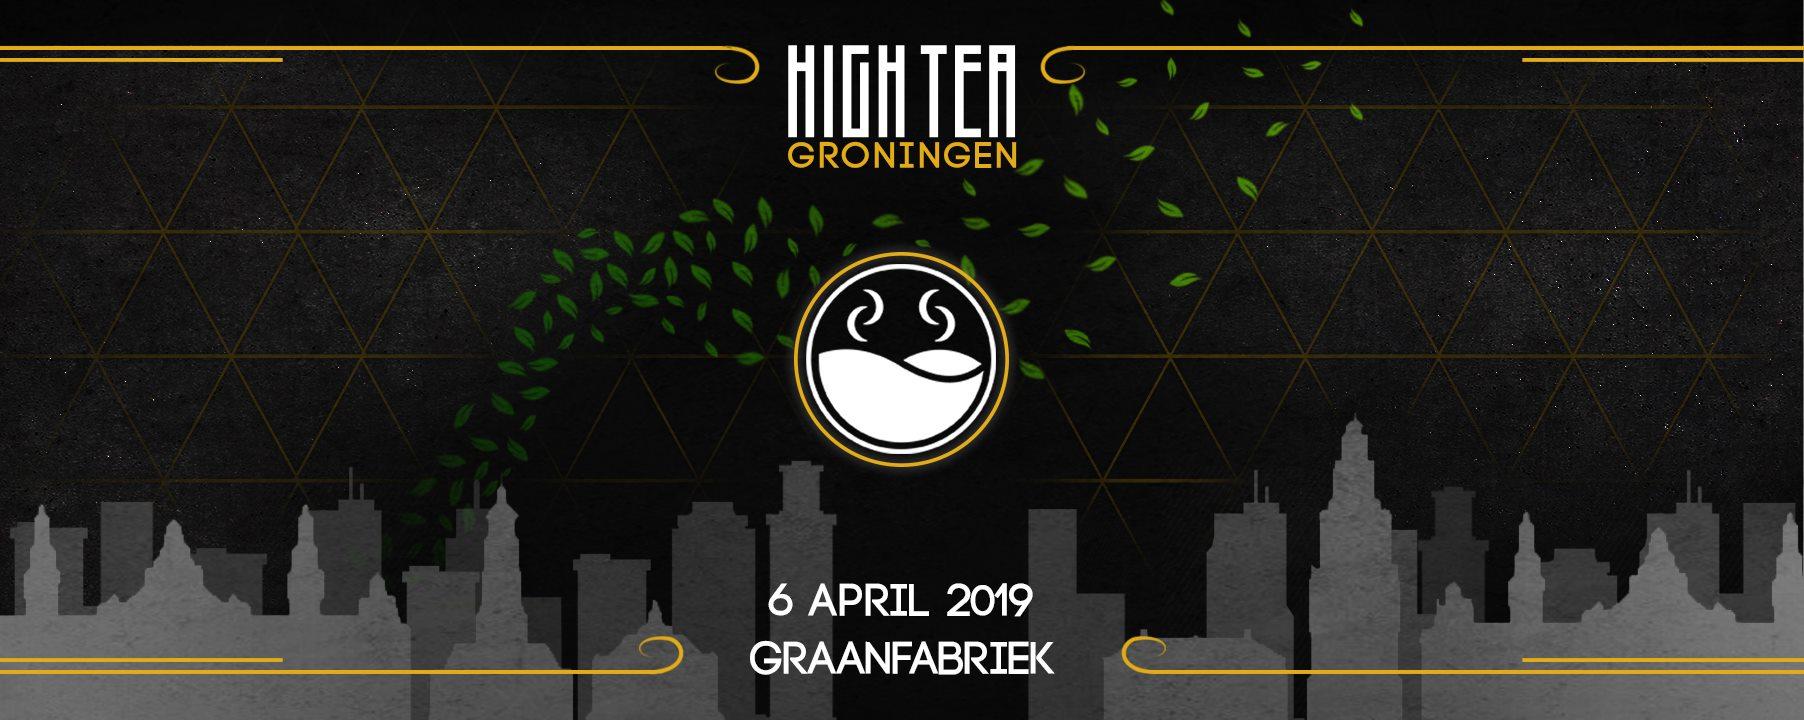 HIGH TEA Groningen